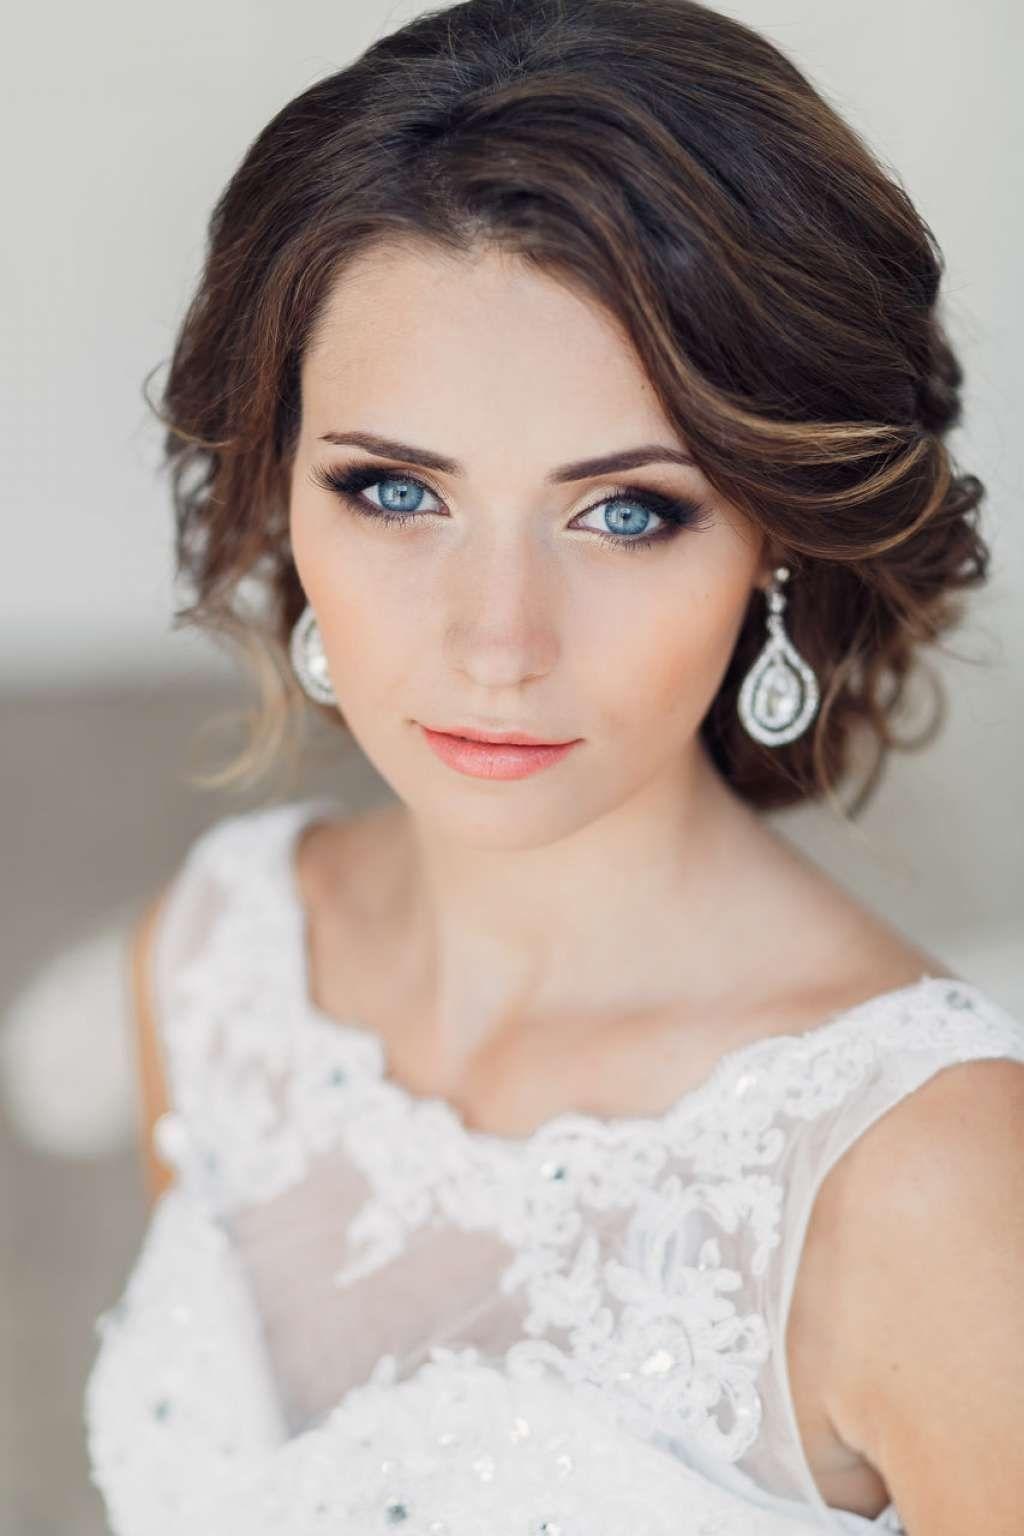 Bridal Makeup For Blue Eyes And Dark Hair :: One1Lady :: #hair regarding Wedding Makeup Blue Eyes Brown Hair